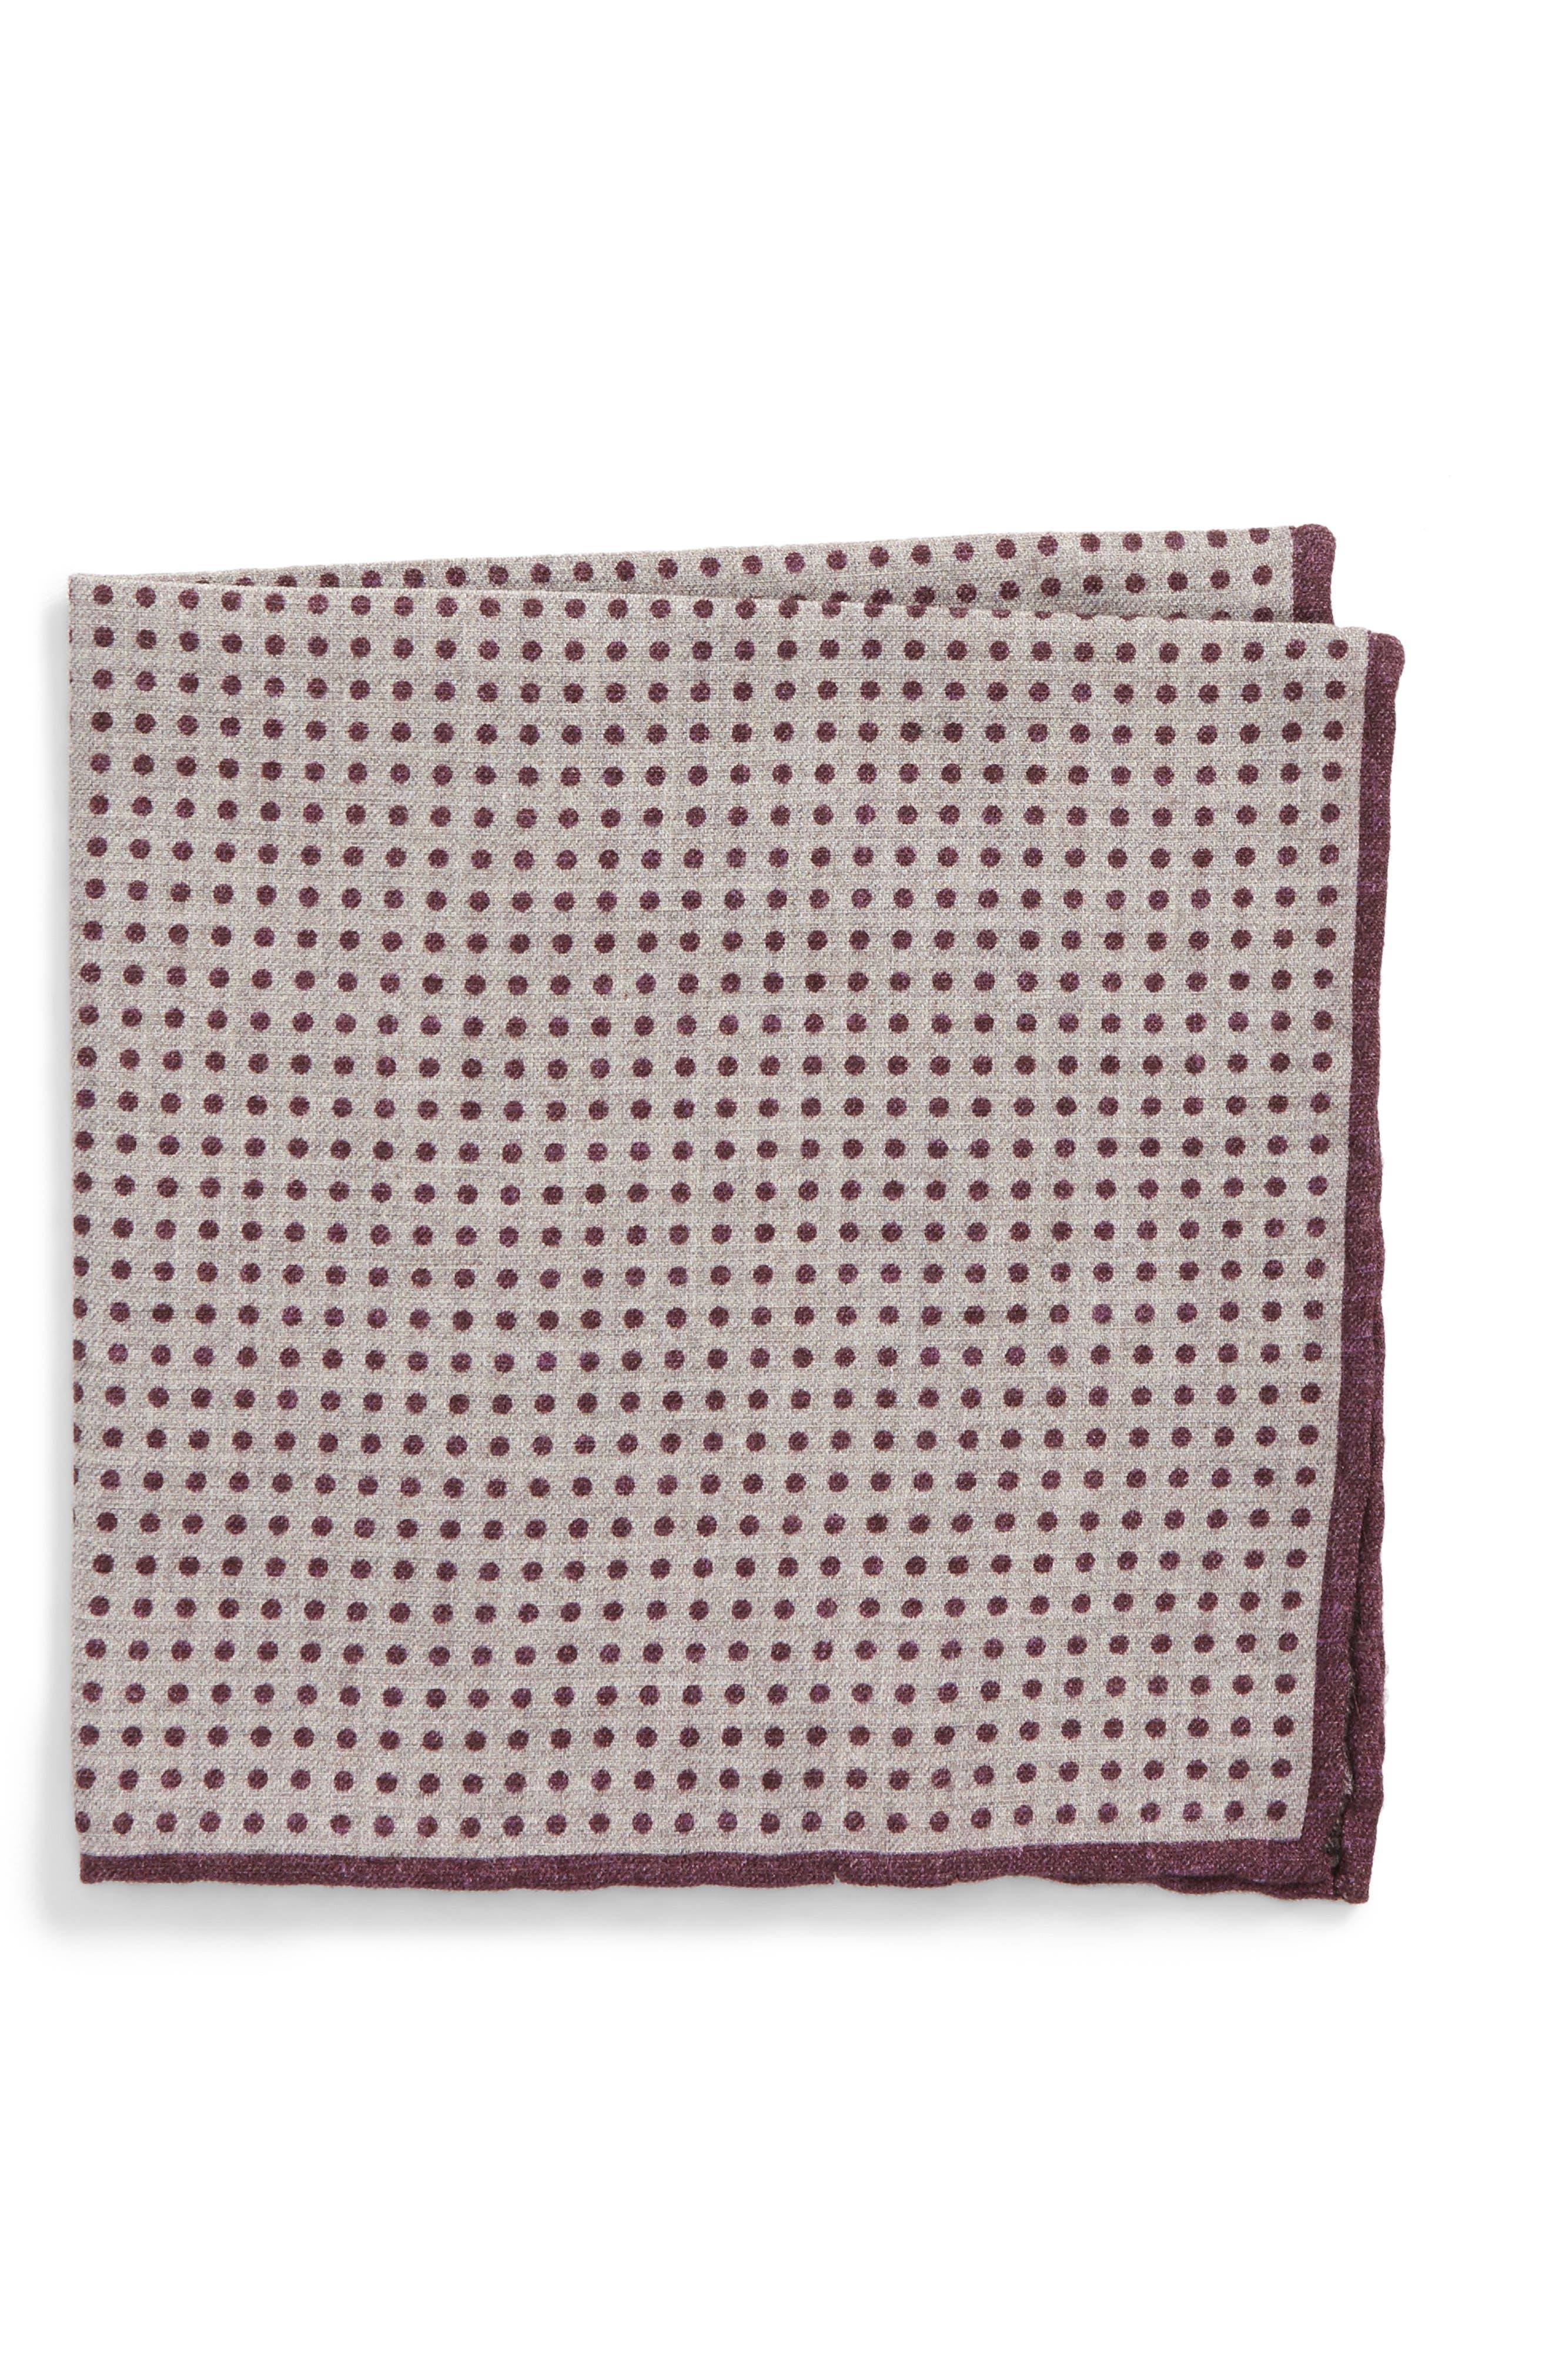 Main Image - Eleventy Dot Wool & Cotton Pocket Square